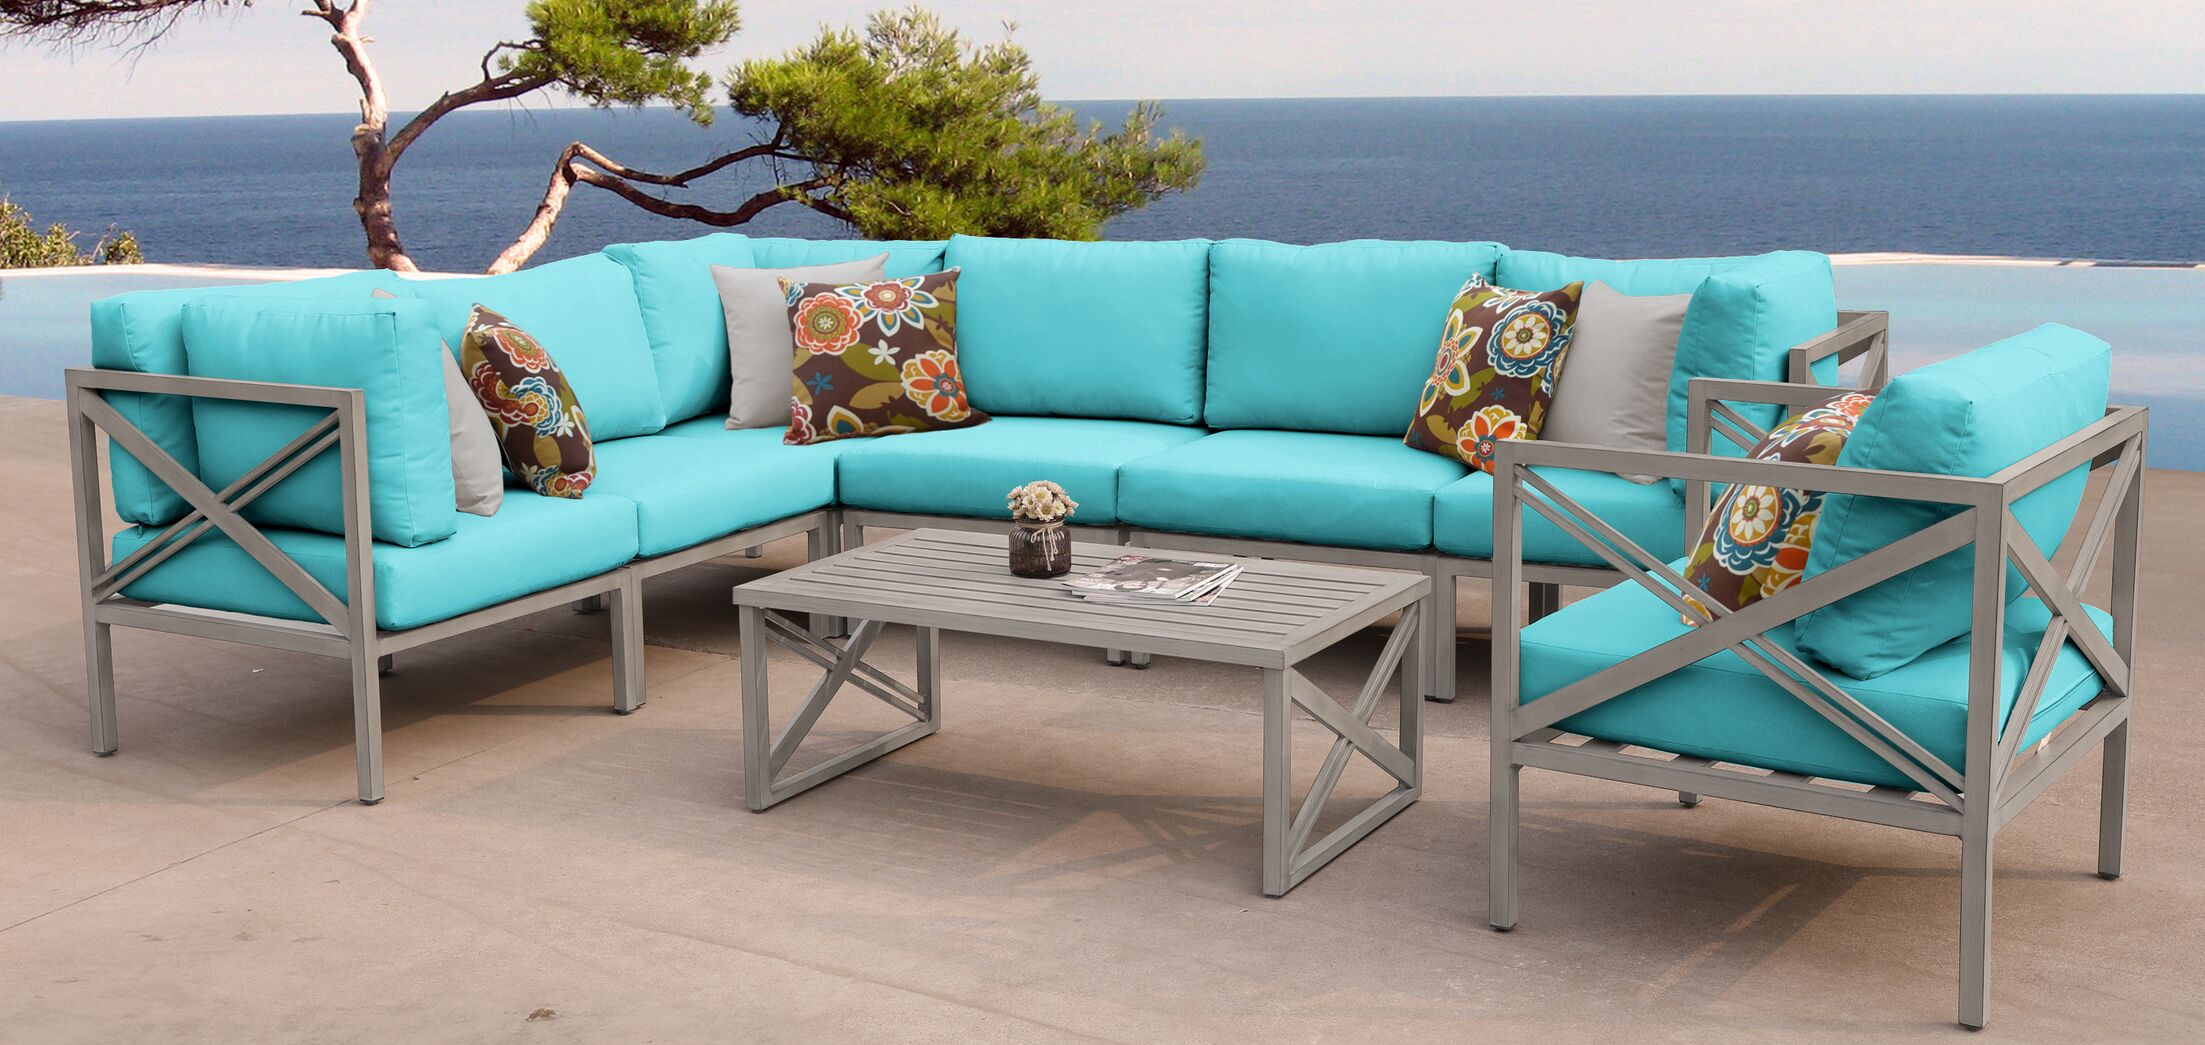 Carlisle 8 Piece Outdoor Sectional Set with Cushions Cushion Color: Aruba